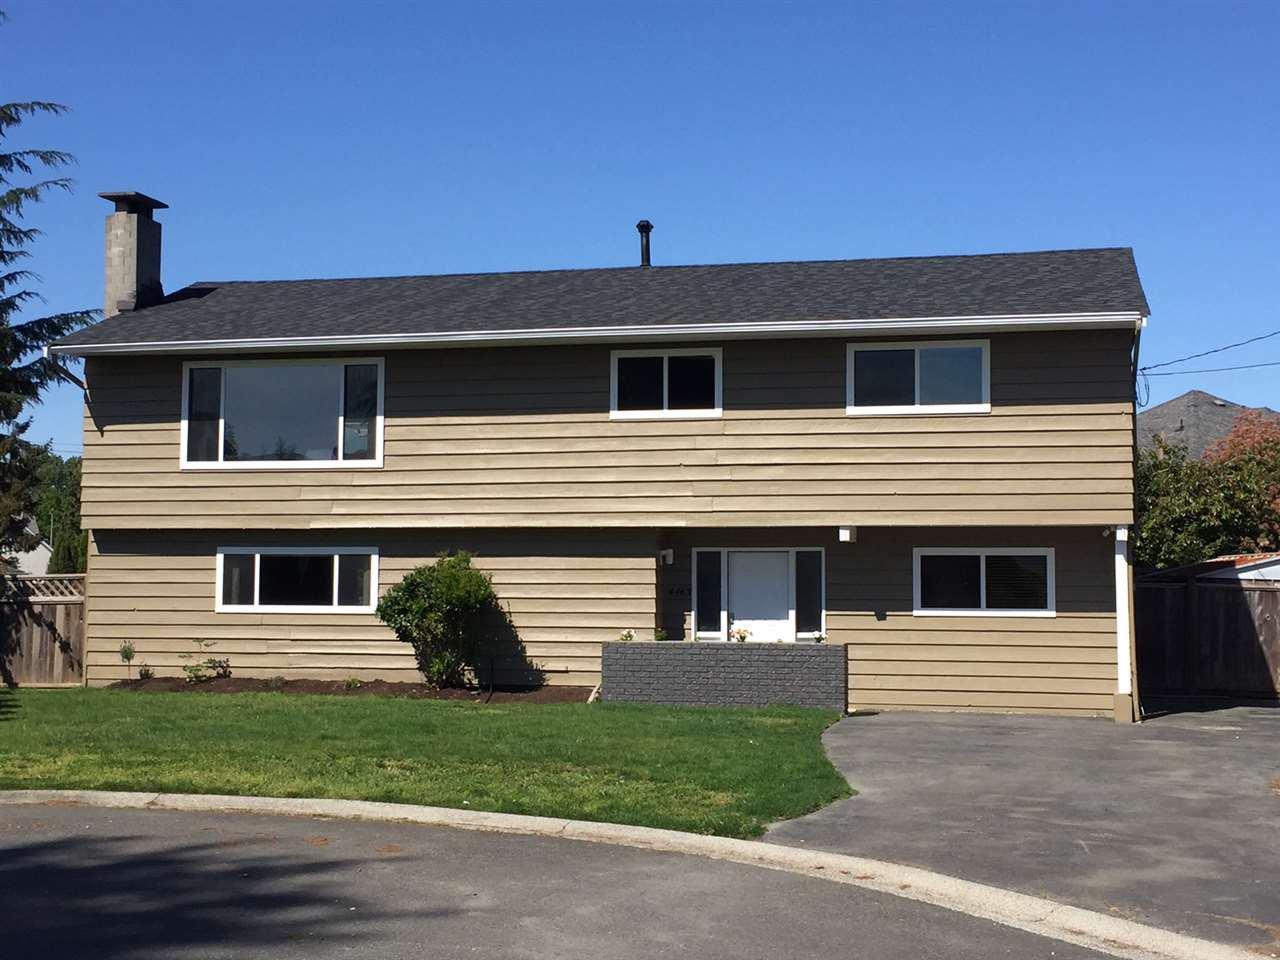 Main Photo: 4463 45A Avenue in Delta: Port Guichon House for sale (Ladner)  : MLS®# R2063199